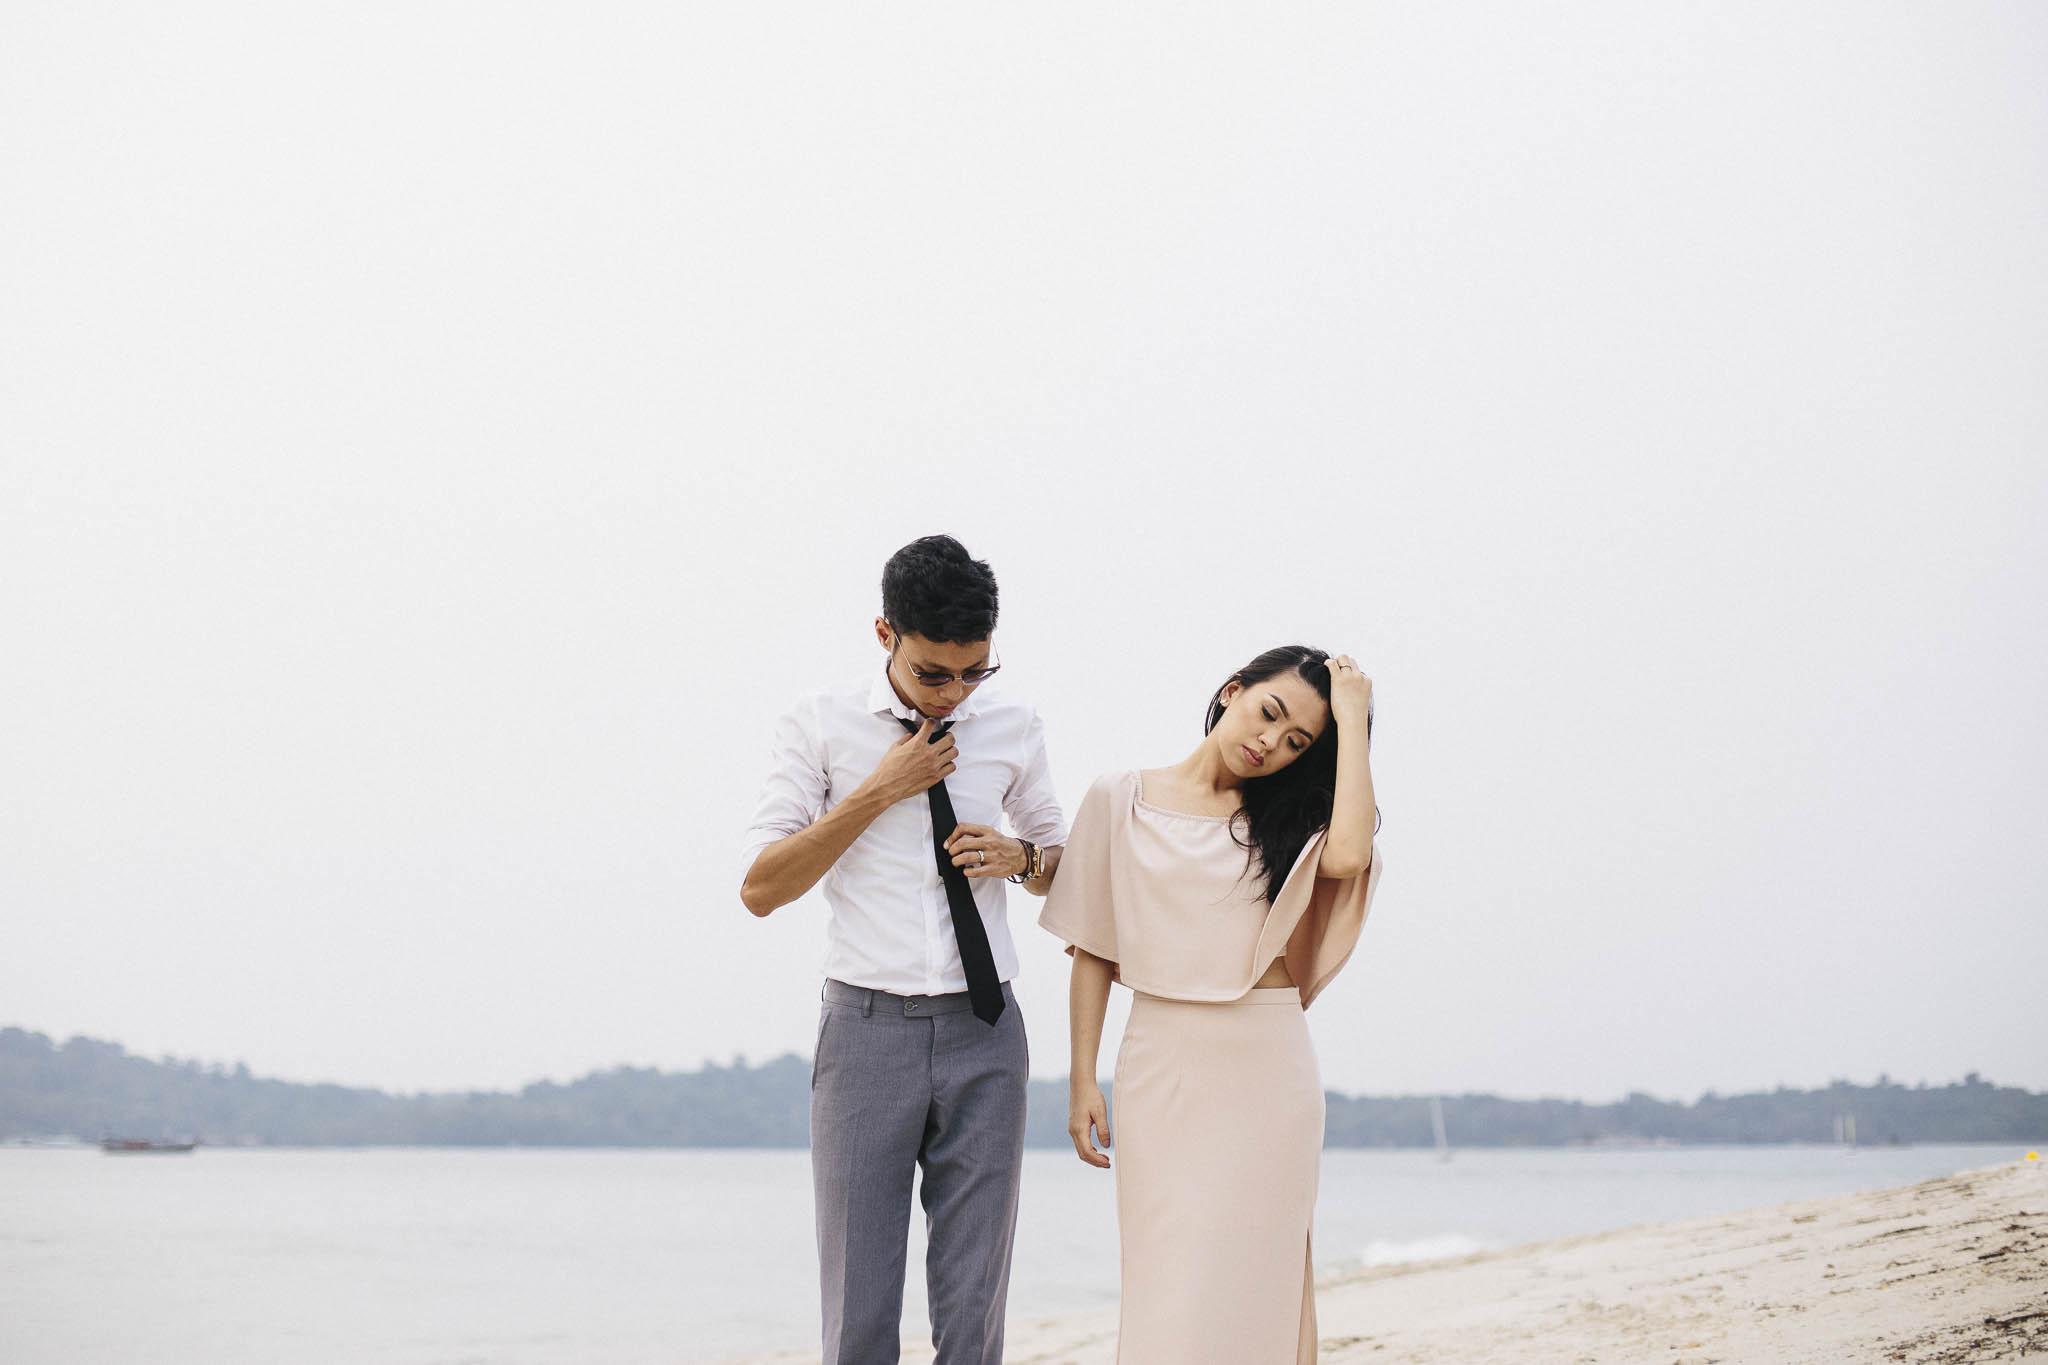 singapore-wedding-photographer-malay-travel-adli-tashah-28.jpg